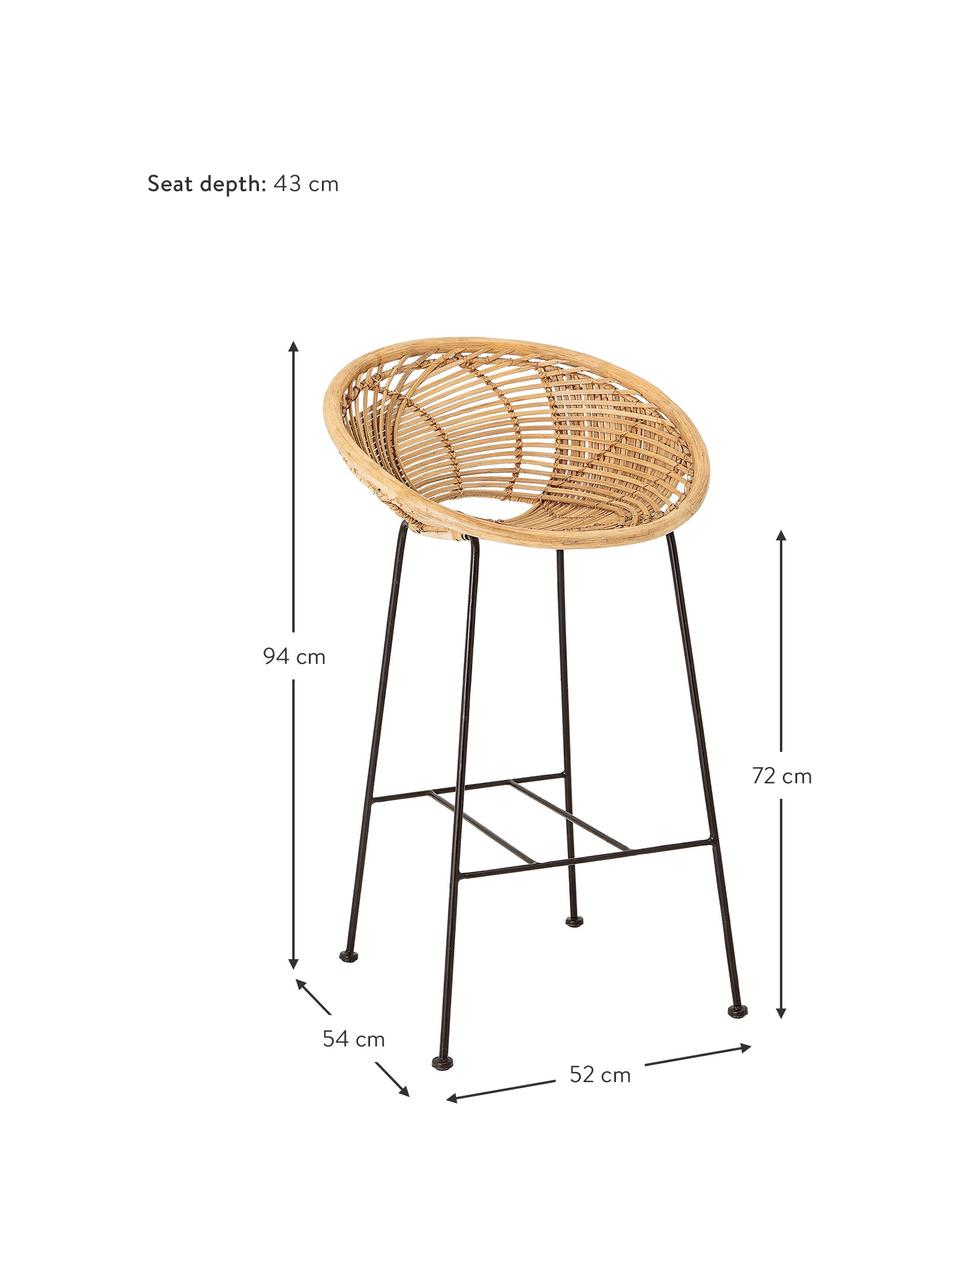 Rattan-Barstuhl Yonne mit Metall-Beinen, Sitzfläche: Rattan, Gestell: Metall, beschichtet, Rattan, Schwarz, 52 x 94 cm